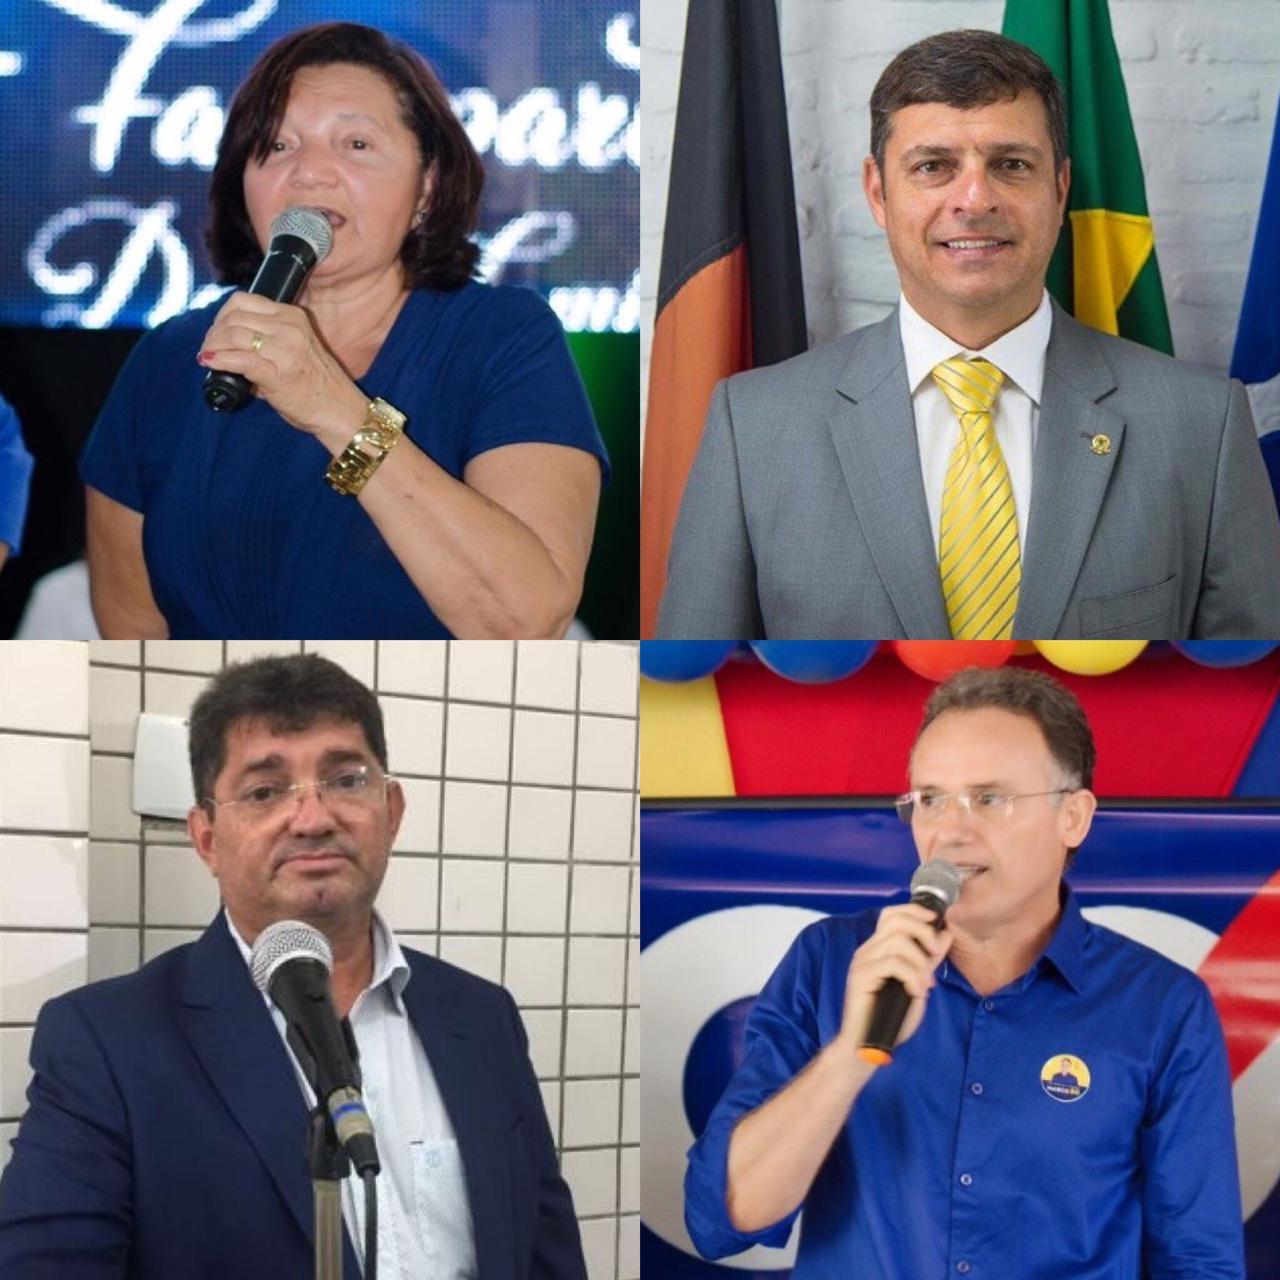 OAB-PB sabatinará candidatos a prefeito no Cabedelo Clube na próxima sexta